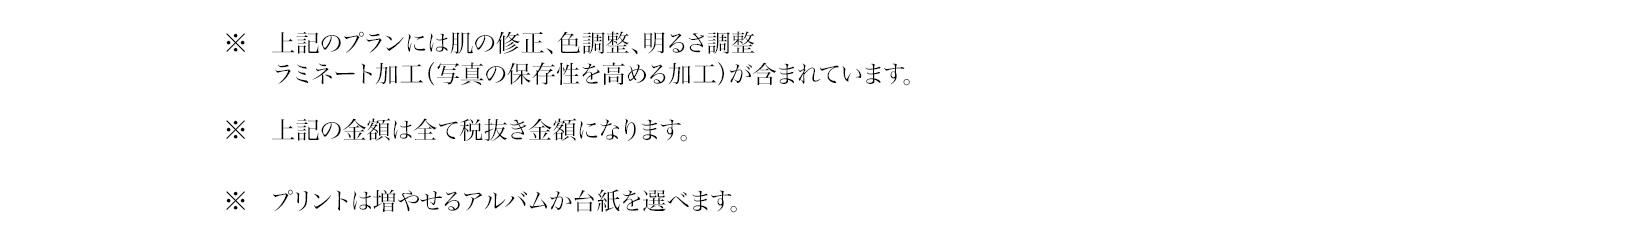 20th_plan05